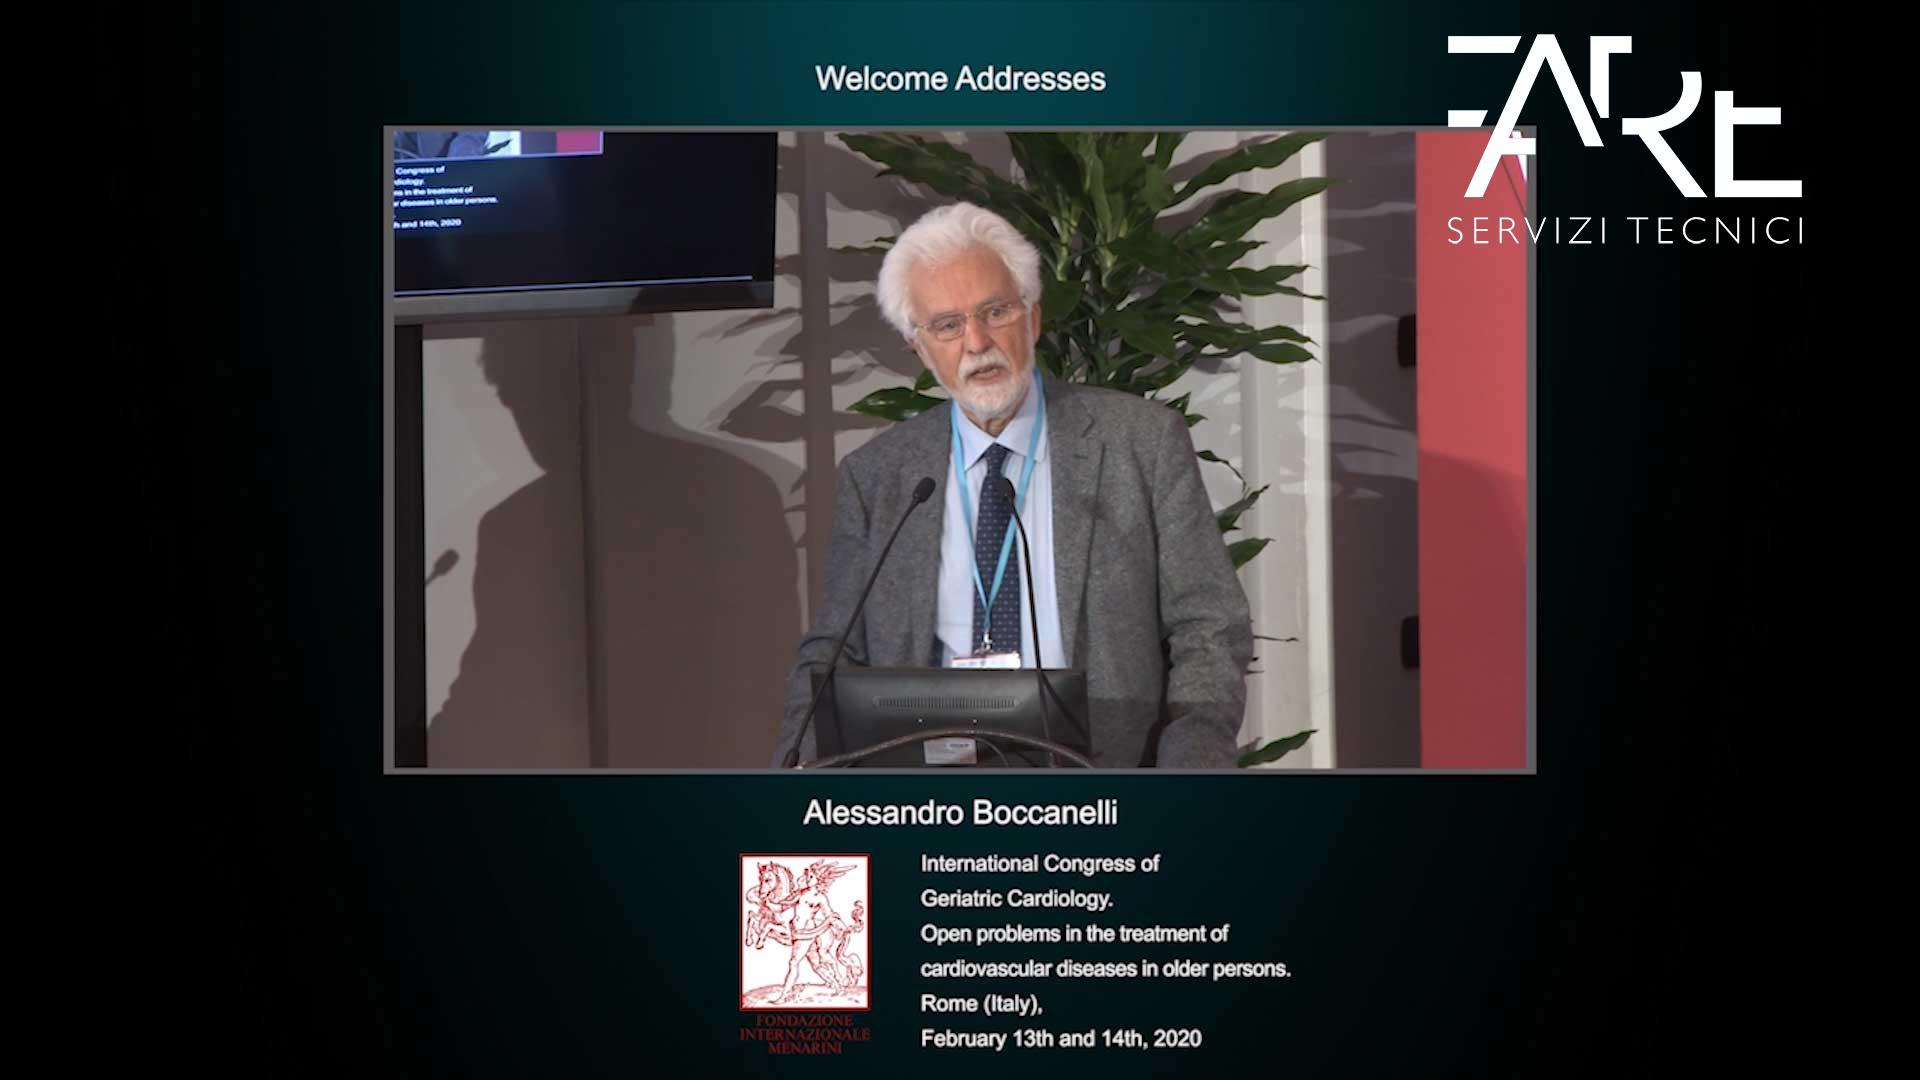 https://www.fareservizitecnici.it/wp-content/uploads/2021/01/Angelicum-fondazione-Menarini-01.jpg